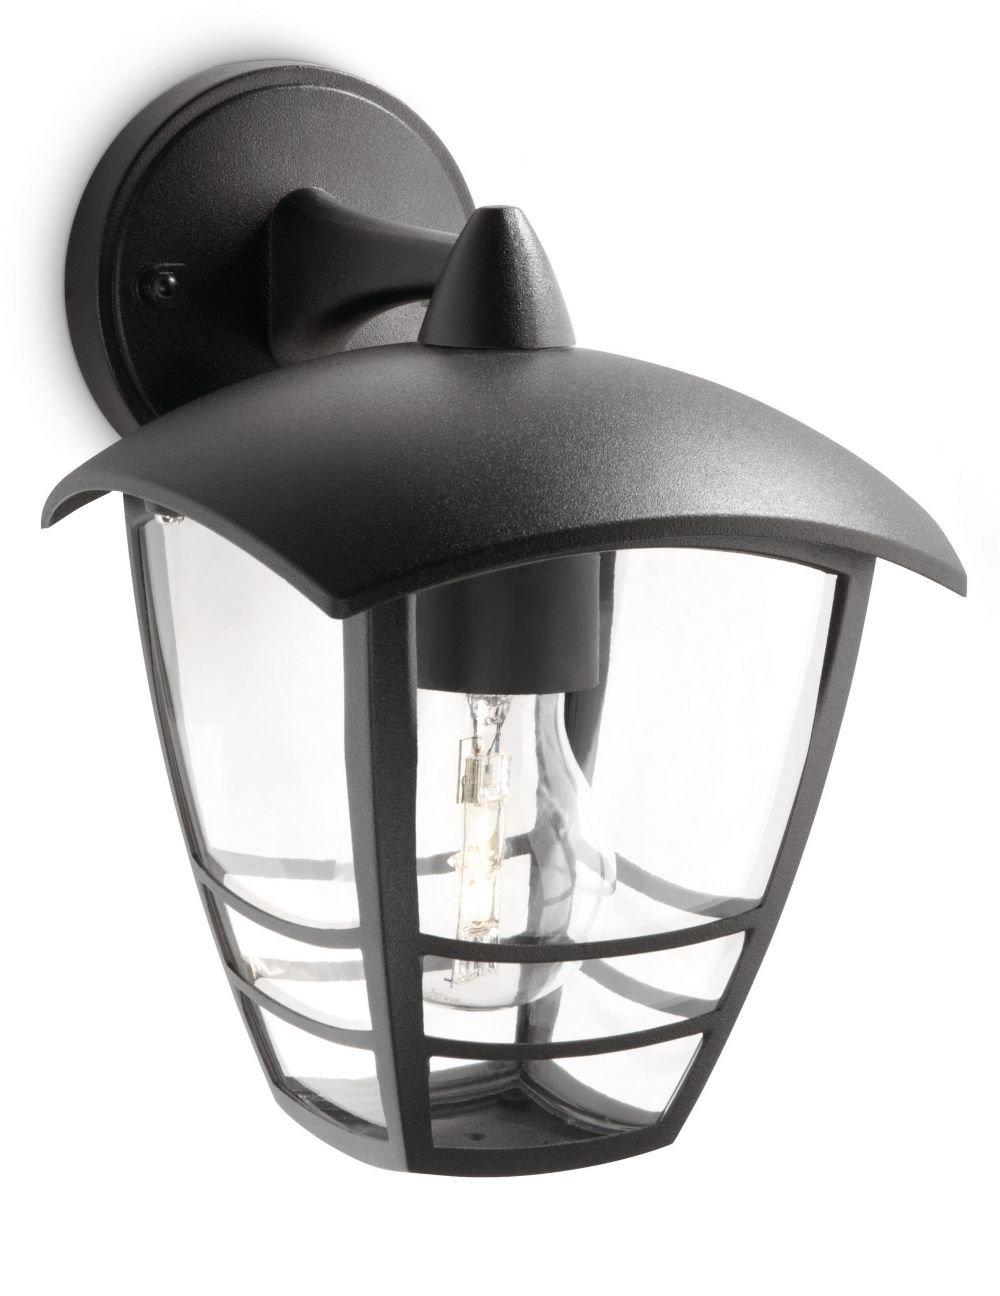 Philips myGarden Creek - Aplique de exterior, con brazo, casquillo gordo E27, bombilla no incluida, 24 cm, color blanco [Clase de eficiencia energética A] 915002790002 153813116 apliques iluminacion